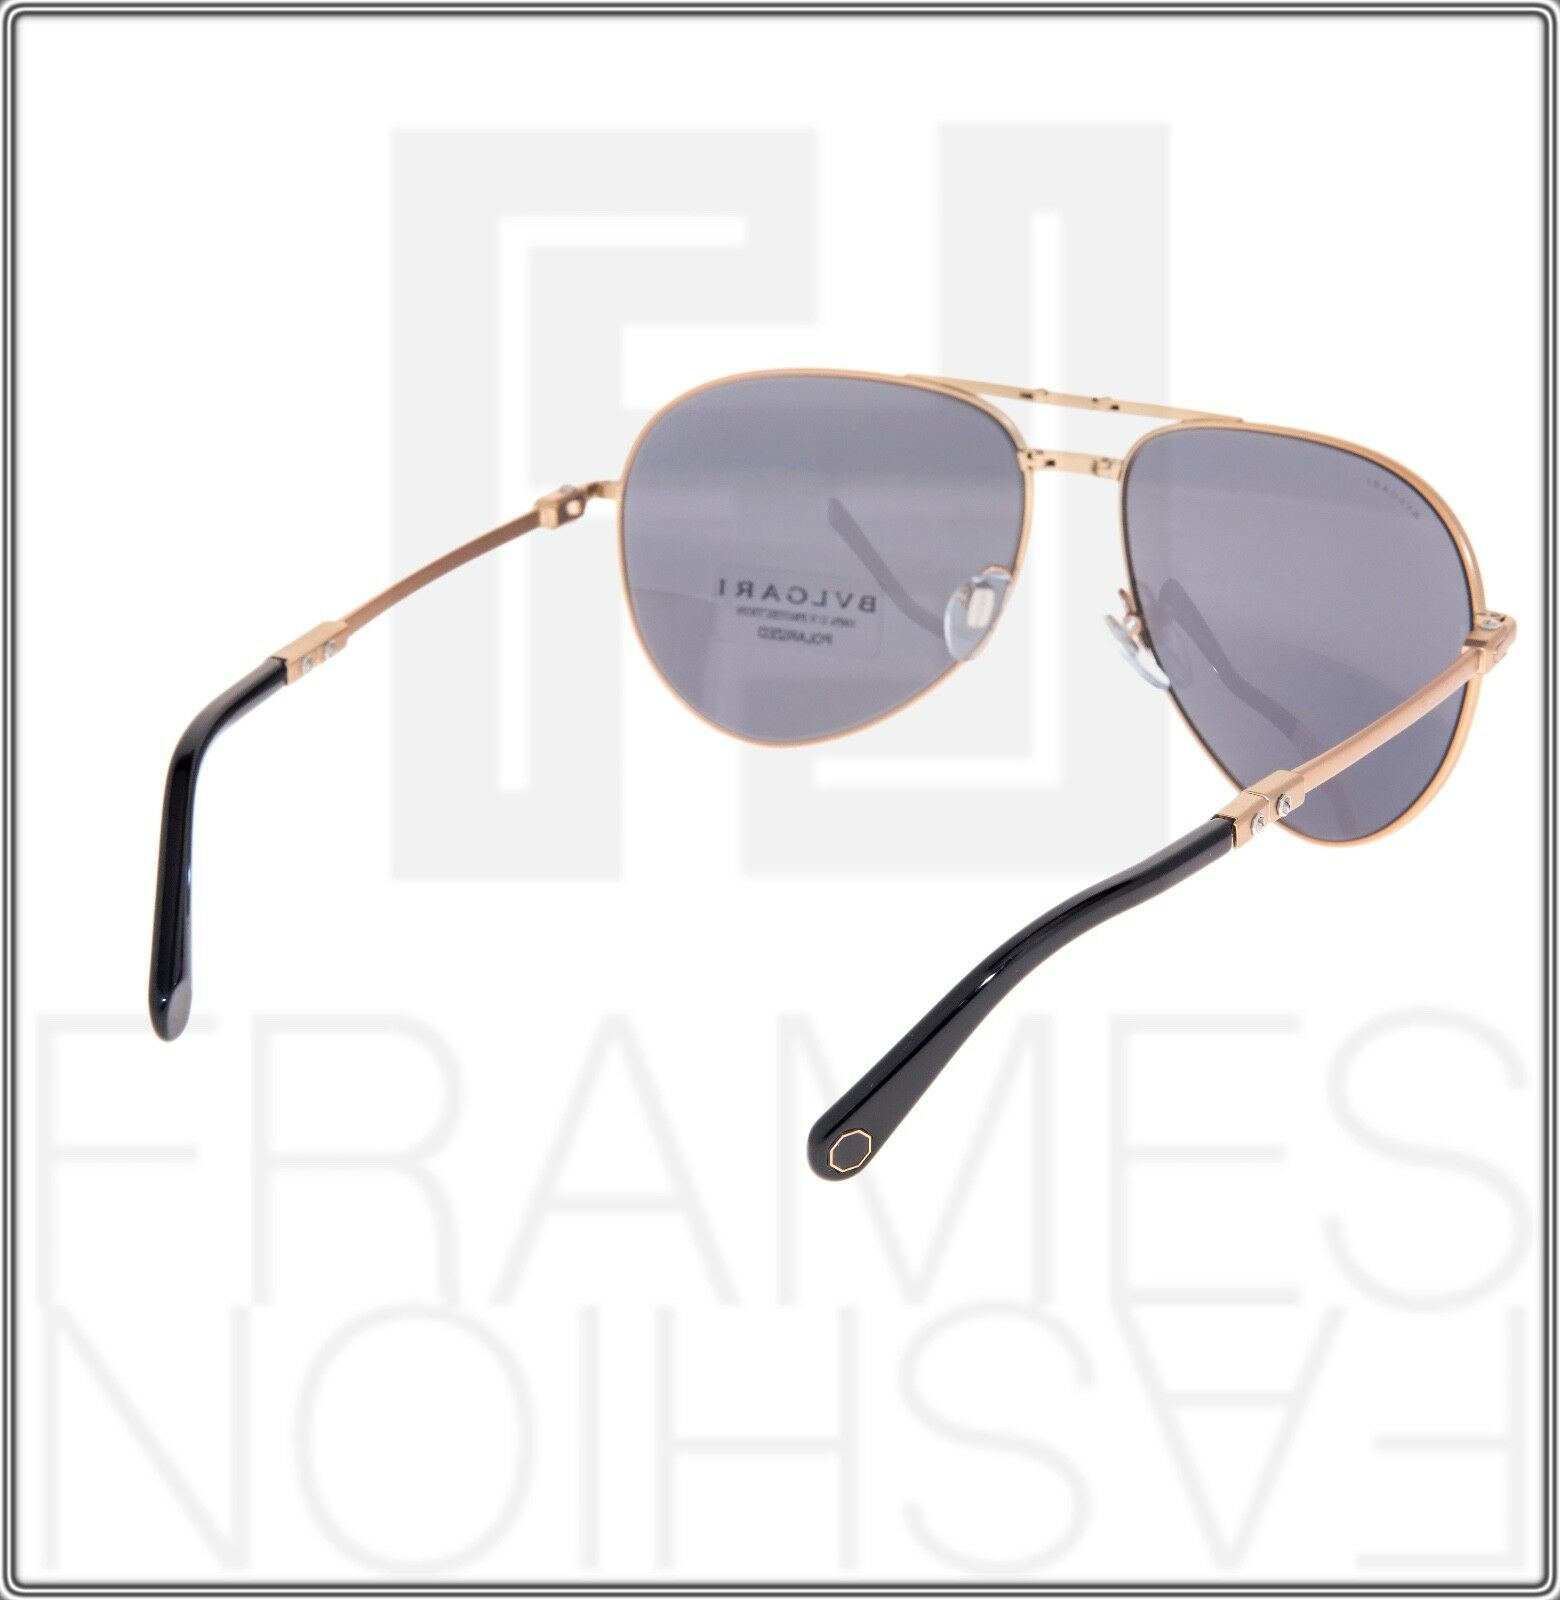 BVLGARI Le Gemme Black Rose Gold 18K Plated POLARIZED Foldable Sunglasses 5034 image 4